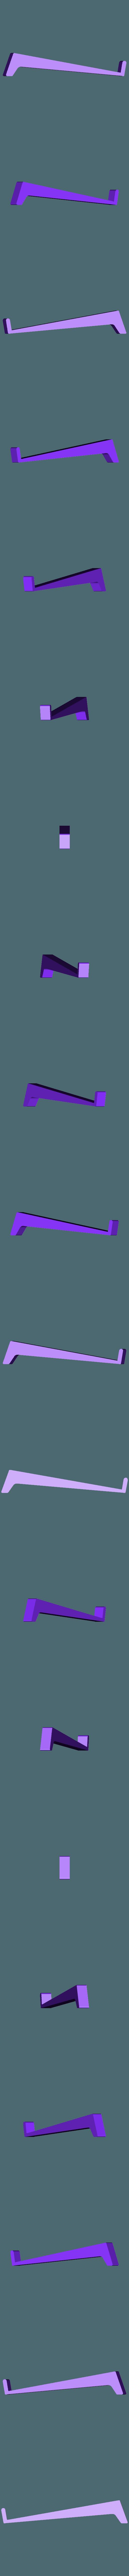 Notebook-Laptop_stand_Martin_Marolt_3.STL Télécharger fichier STL gratuit Notebook Stand- Soporte para notebook o laptop • Plan pour impression 3D, martinmarolt17